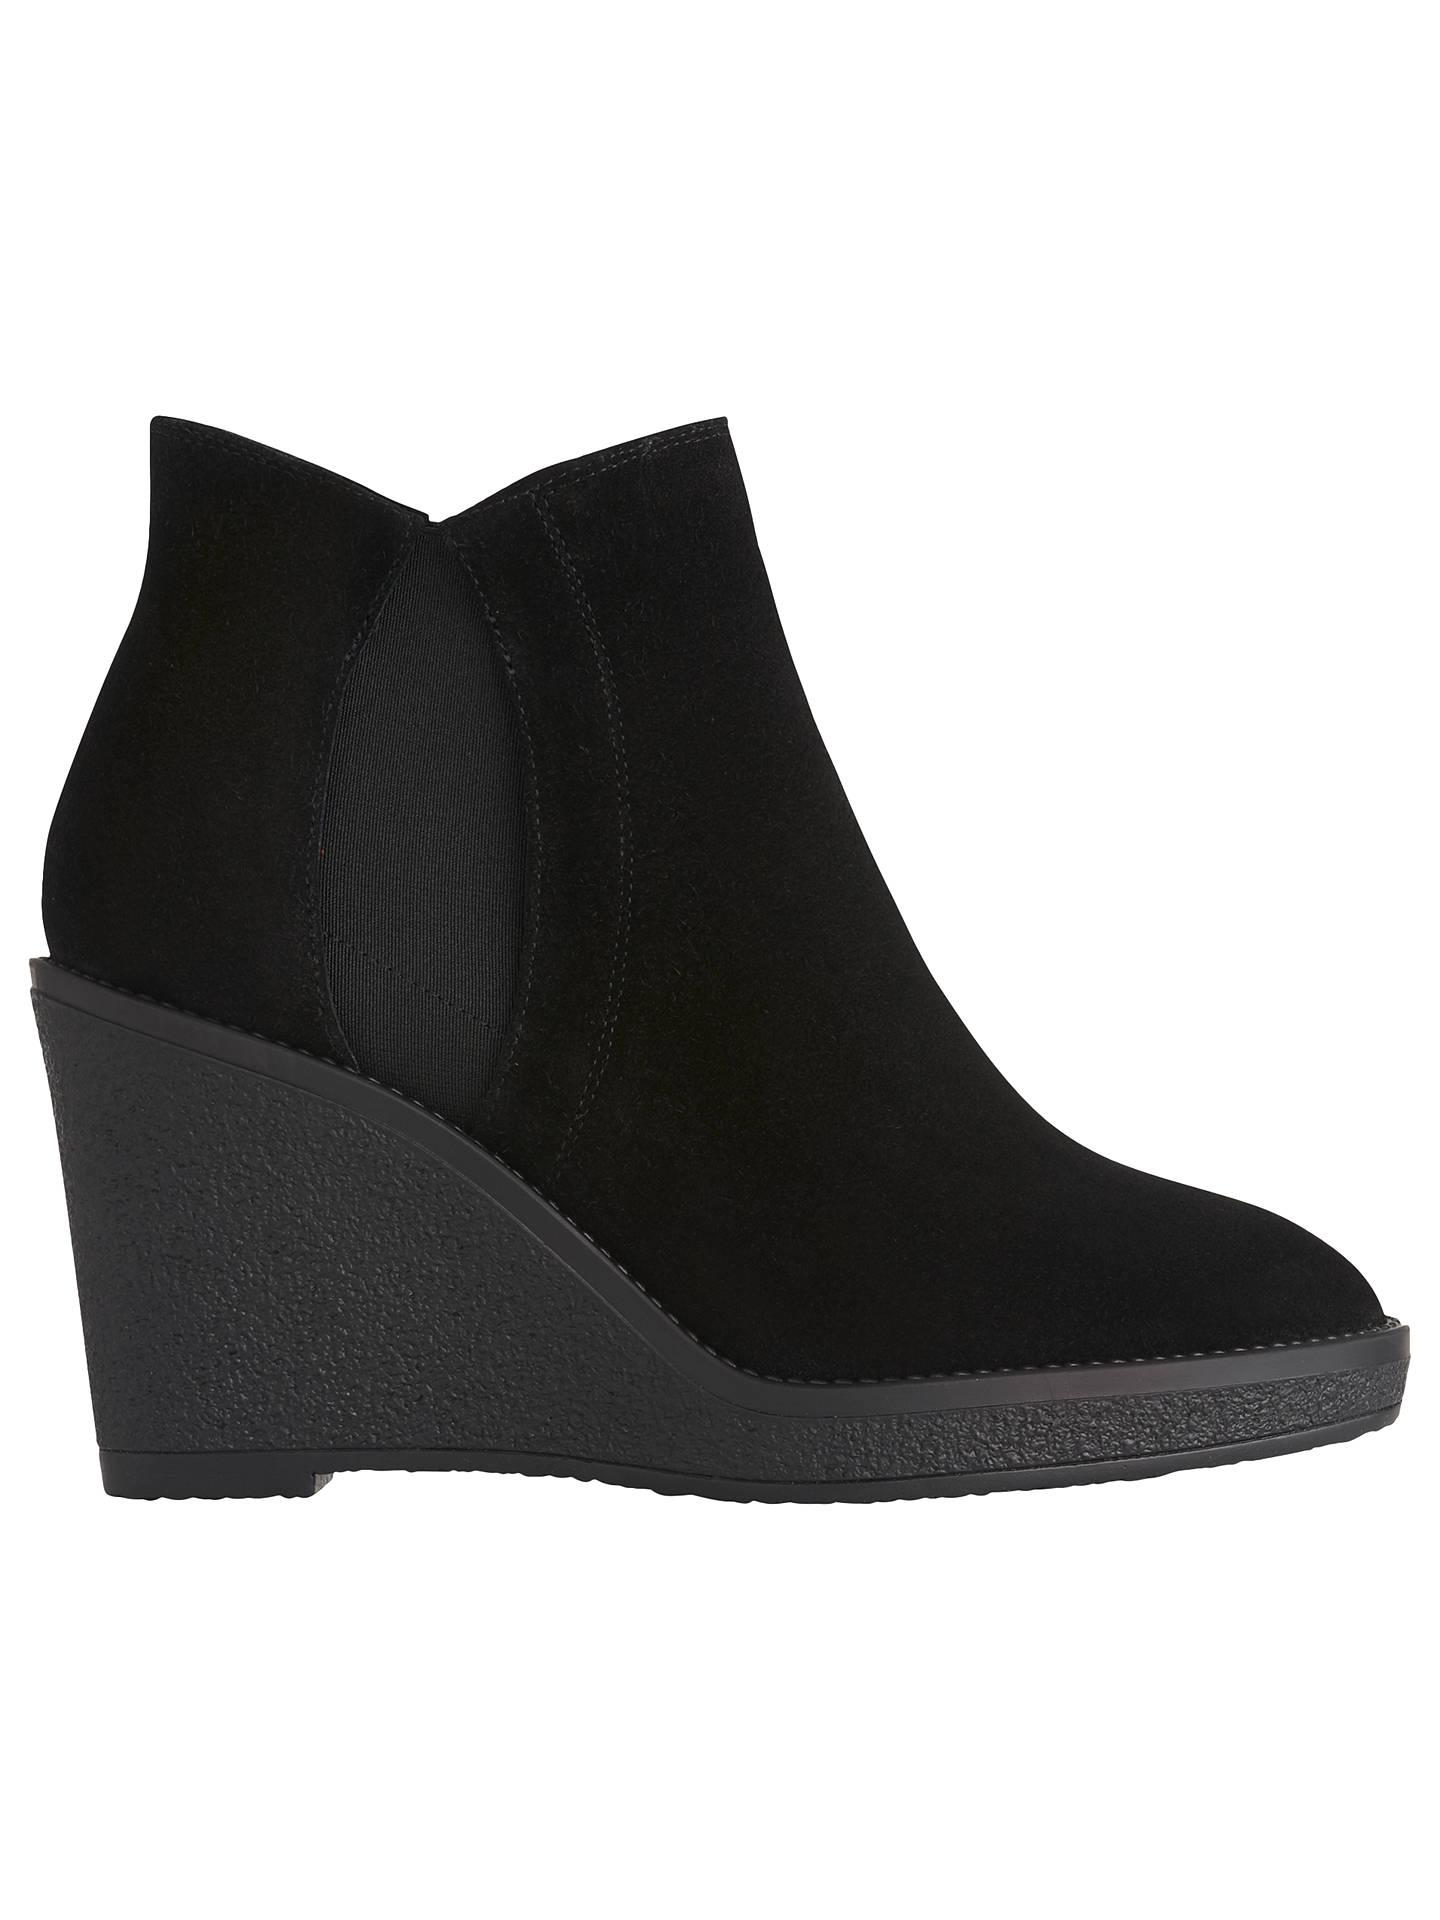 b1637b42249 Buy L.K. Bennett Josephine Suede Wedge Boots